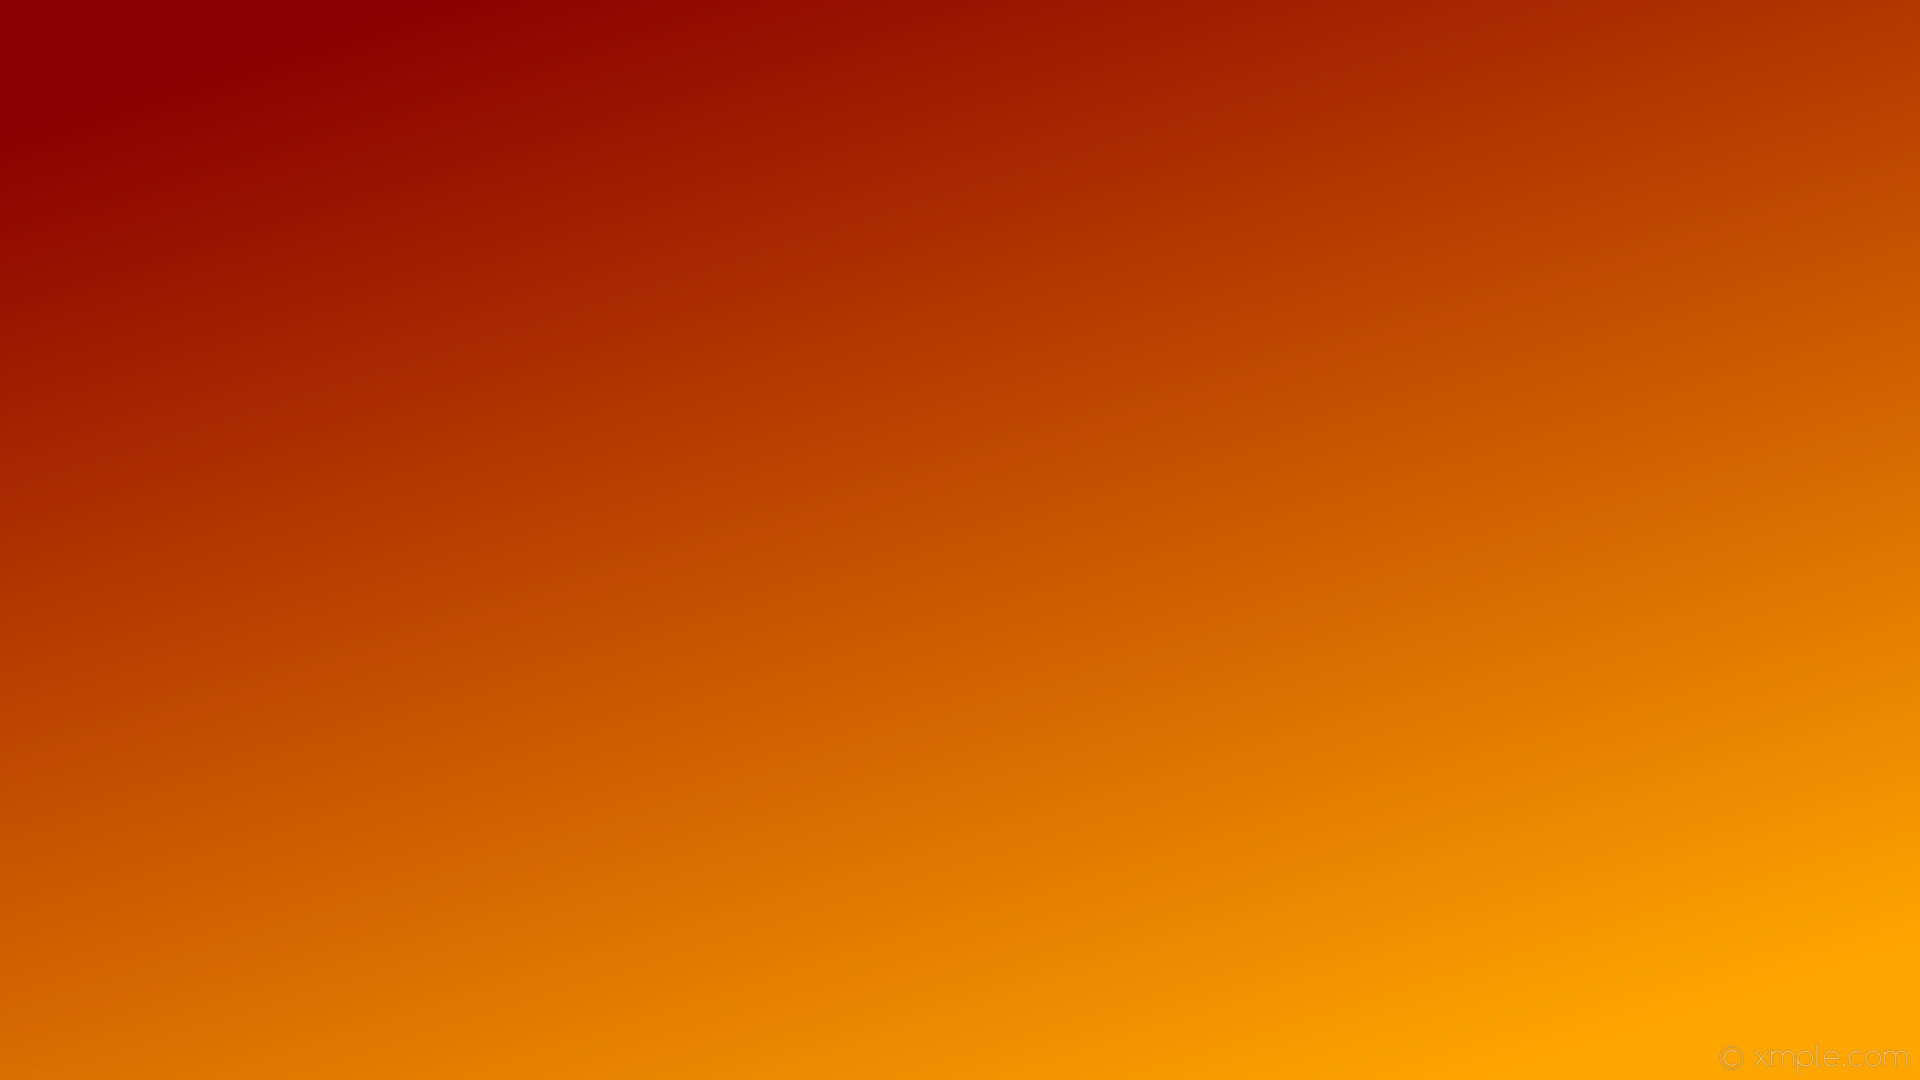 Dark Orange Wallpaper (84+ images)